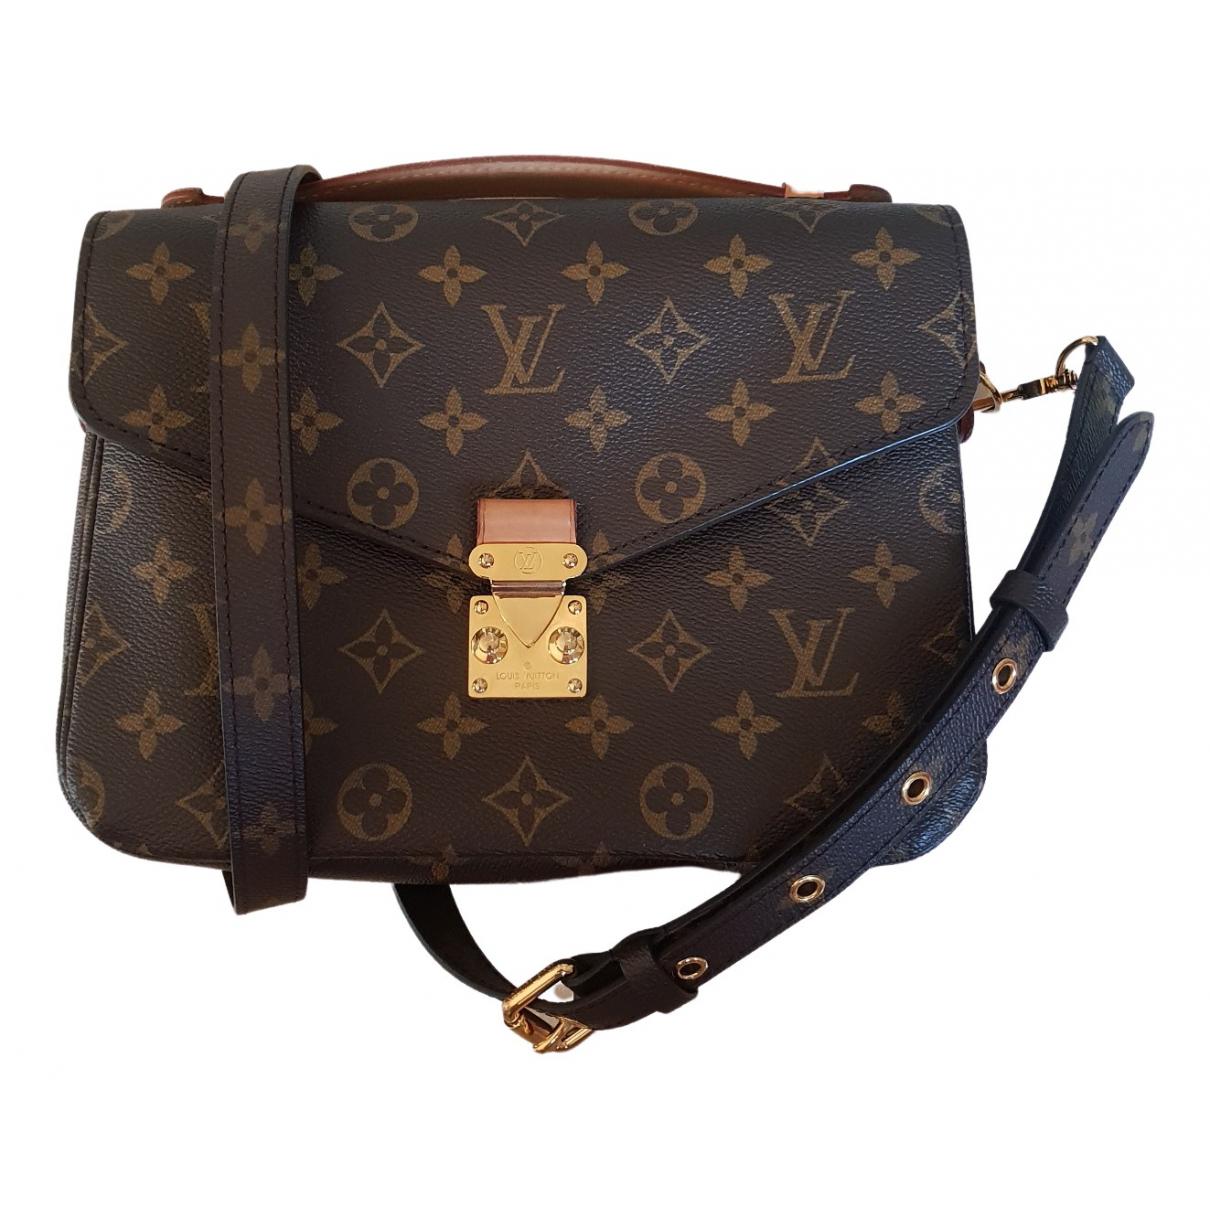 Louis Vuitton - Sac a main Metis pour femme en toile